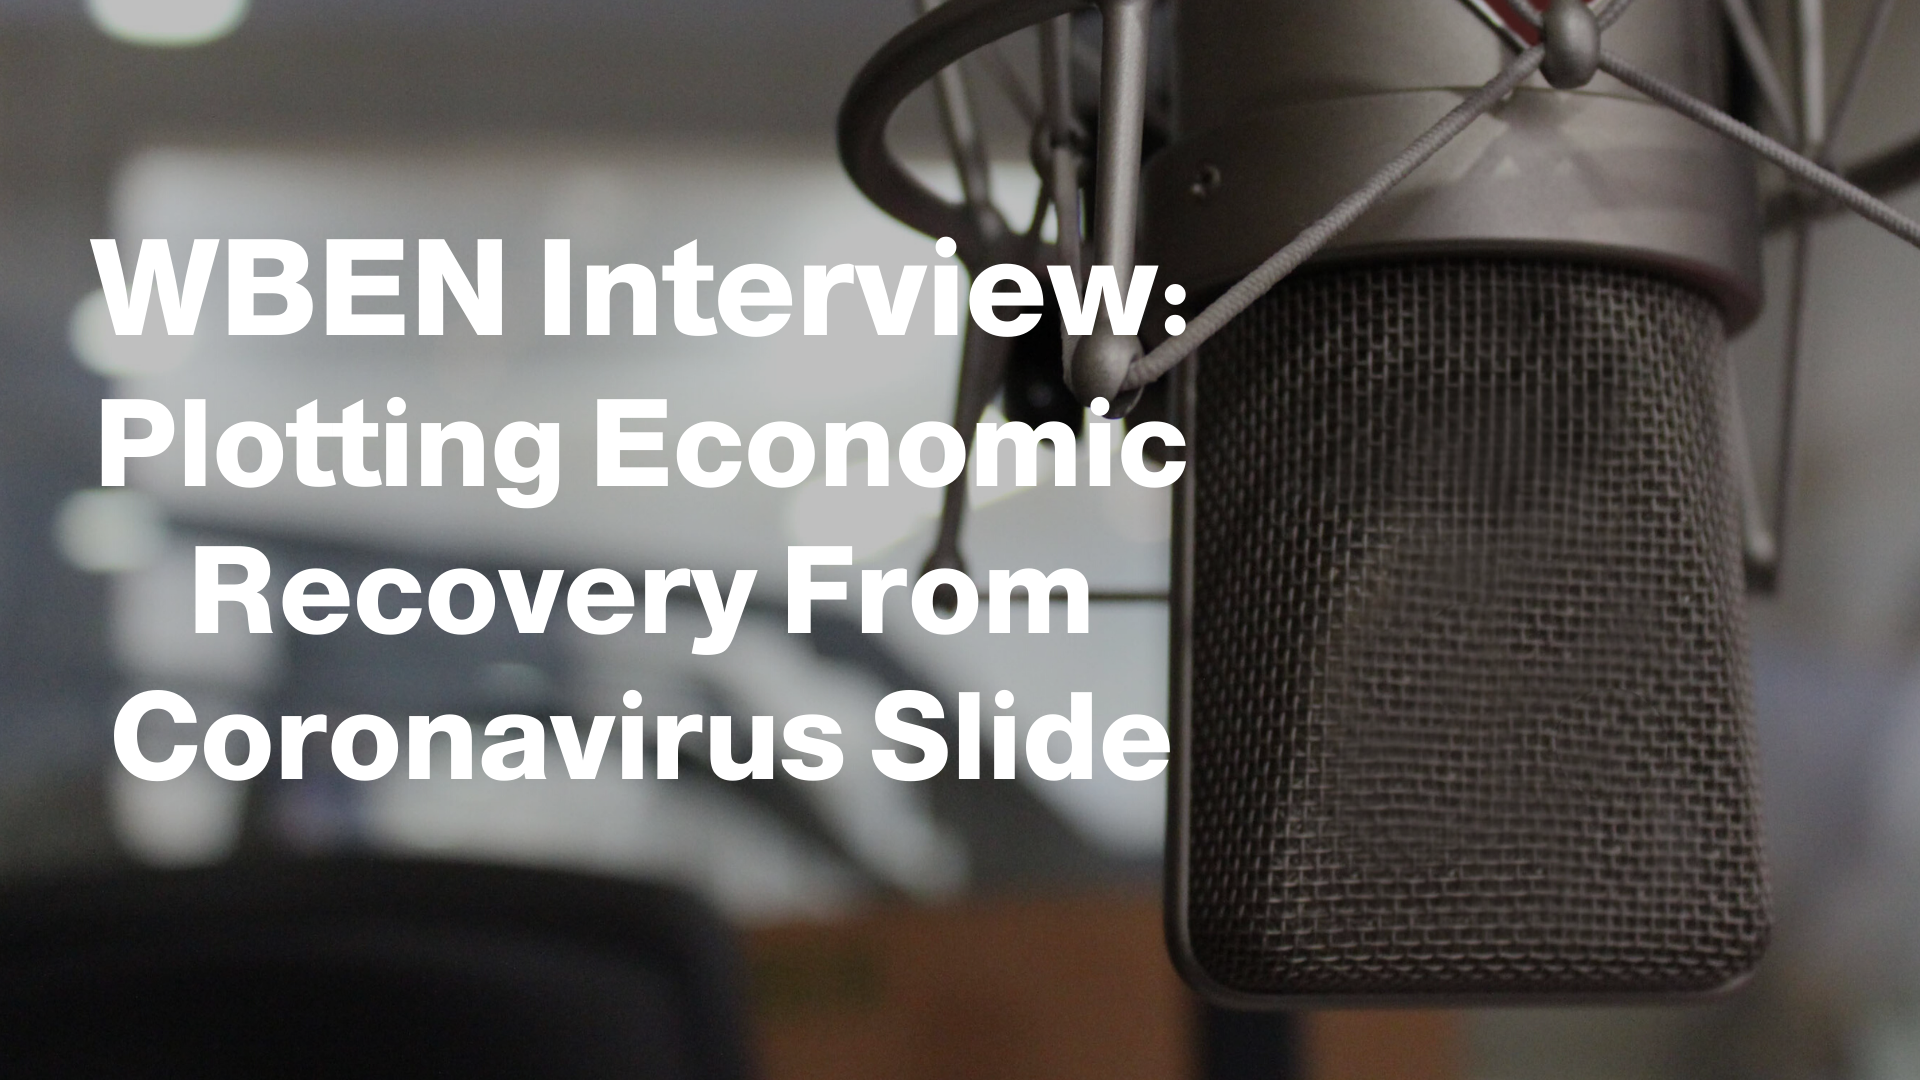 WBEN Interview: Plotting Economic Recovery From Coronavirus Slide